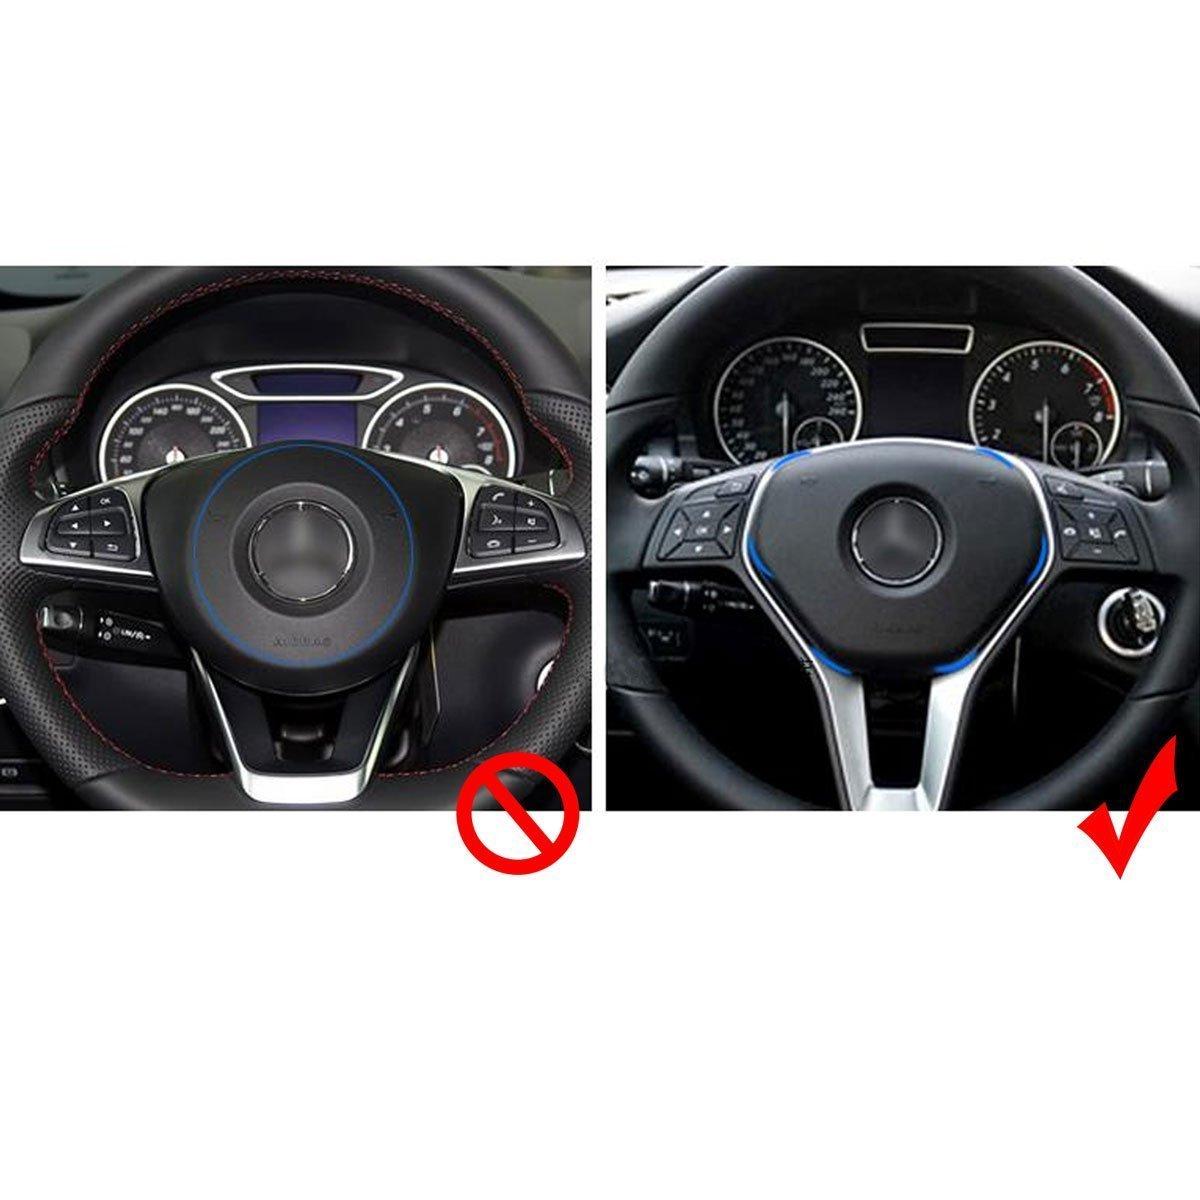 Car 3D Steering Wheel Center Logo Trim Ring for Mercedes Benz B C GLK Xotic Tech Car Interior Decoration Aluminum Alloy Blue Xotic Tech Direct